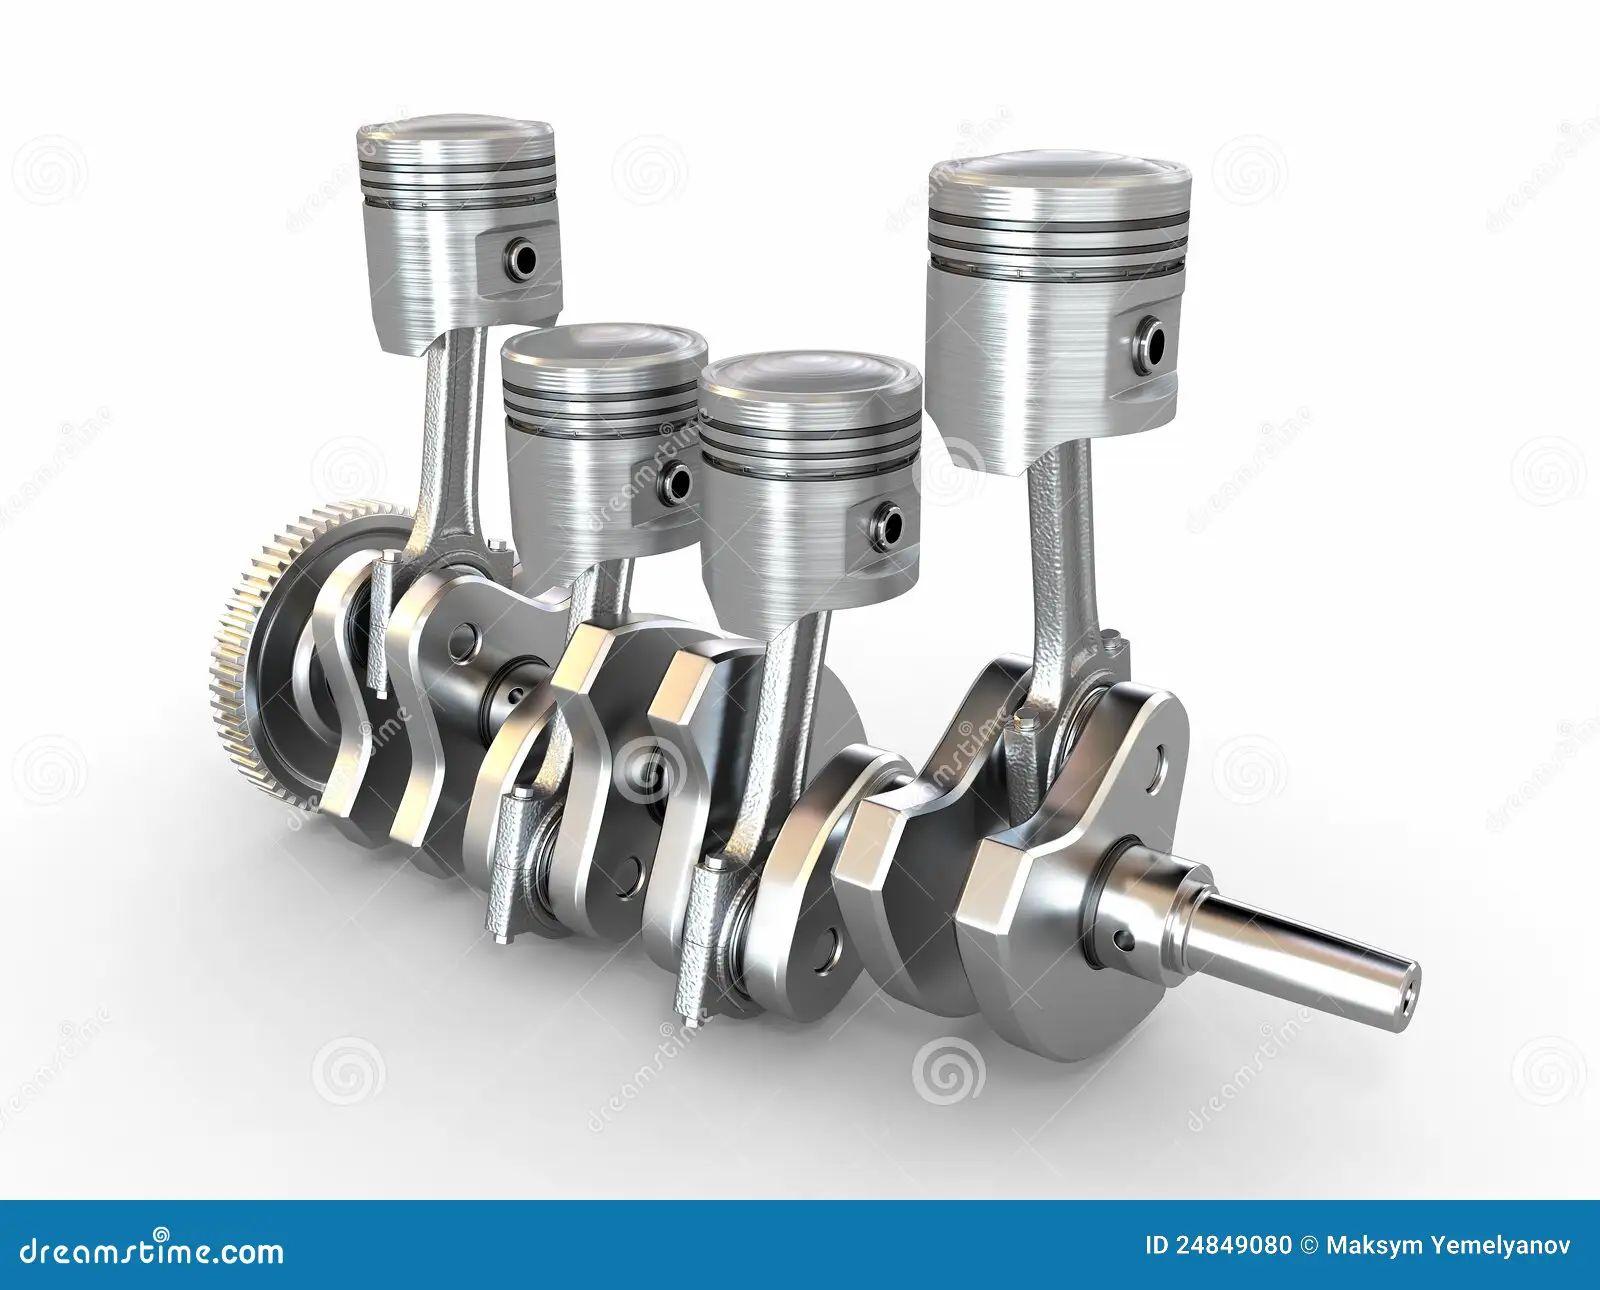 Moped Engine Diagram Auto Electrical Wiring Yamaha Zuma Race Engines Ignition System Free